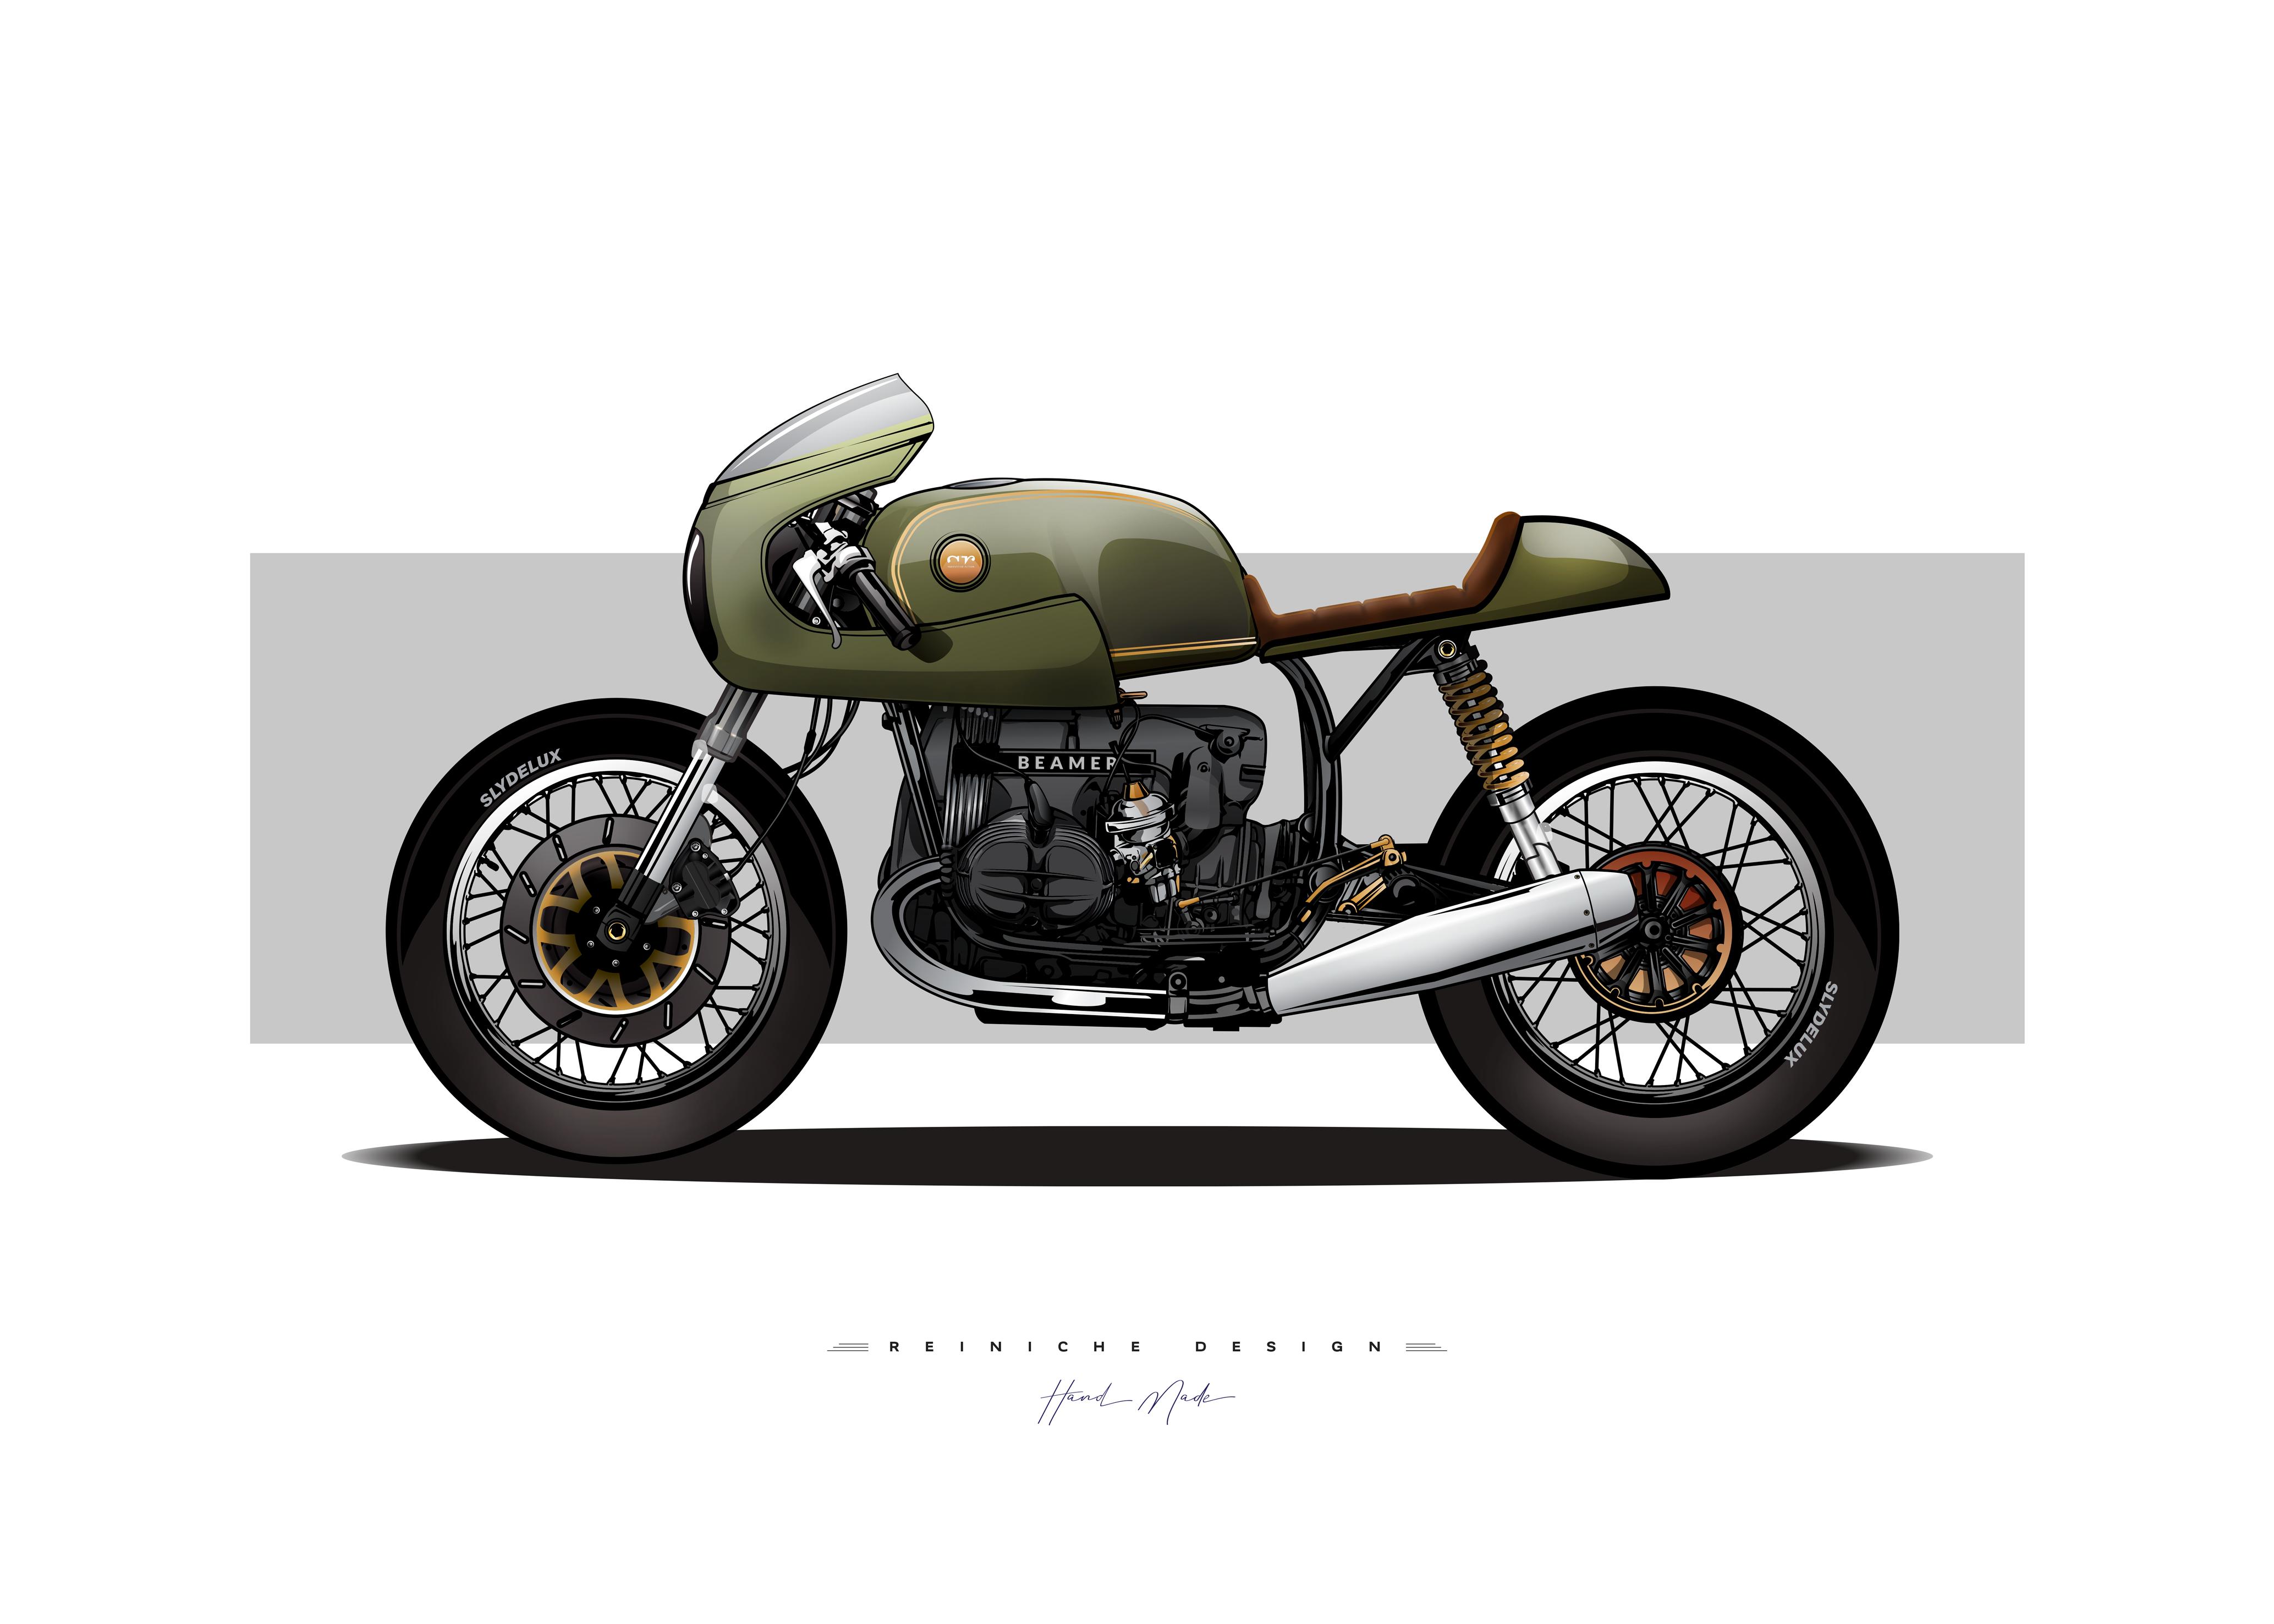 Moto Bmw R100 Cafe Racer 1984 Slydelux Designer Photographer Illustrator